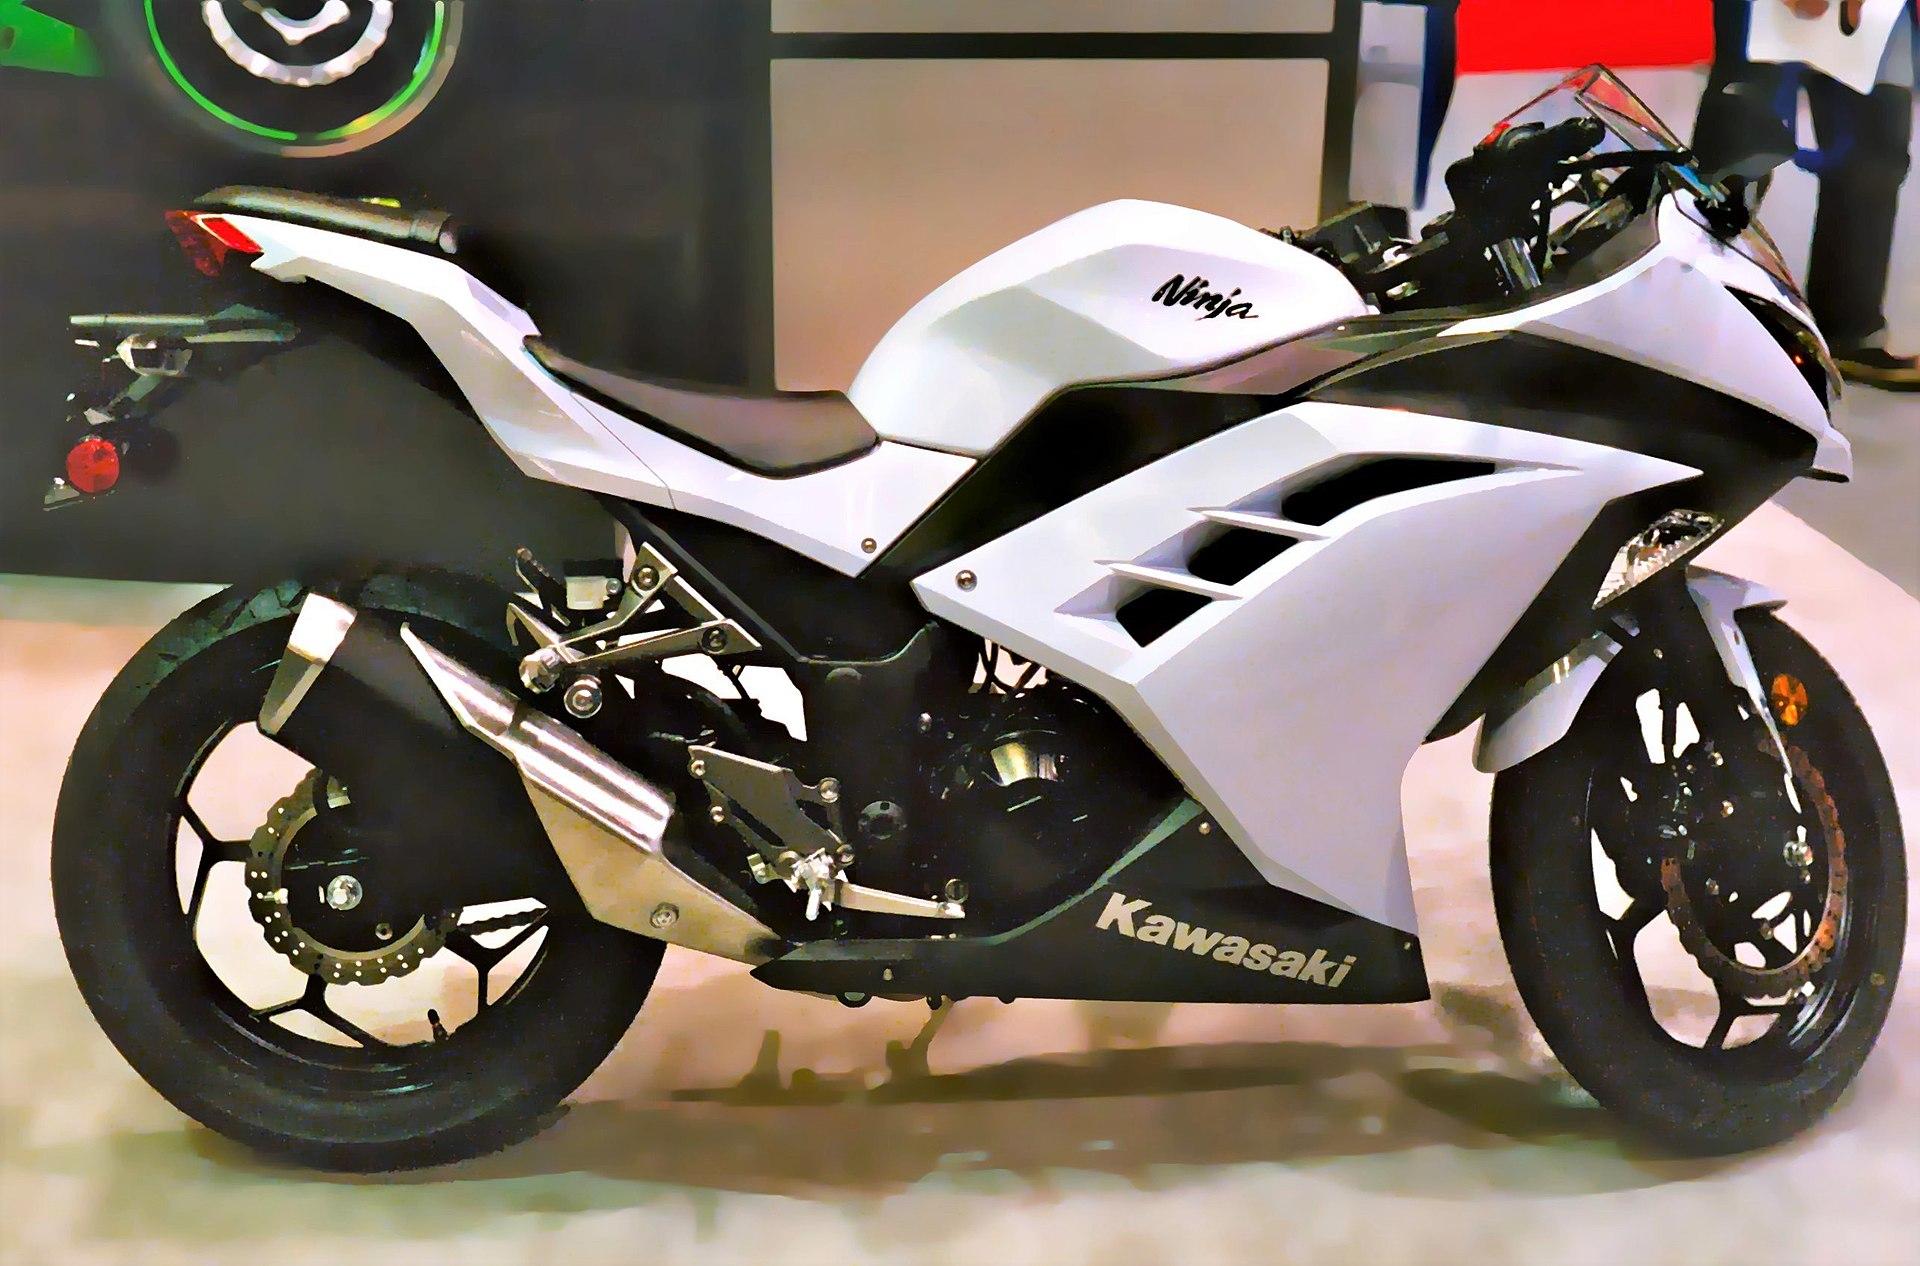 Kawasaki Ninja Cc Gede